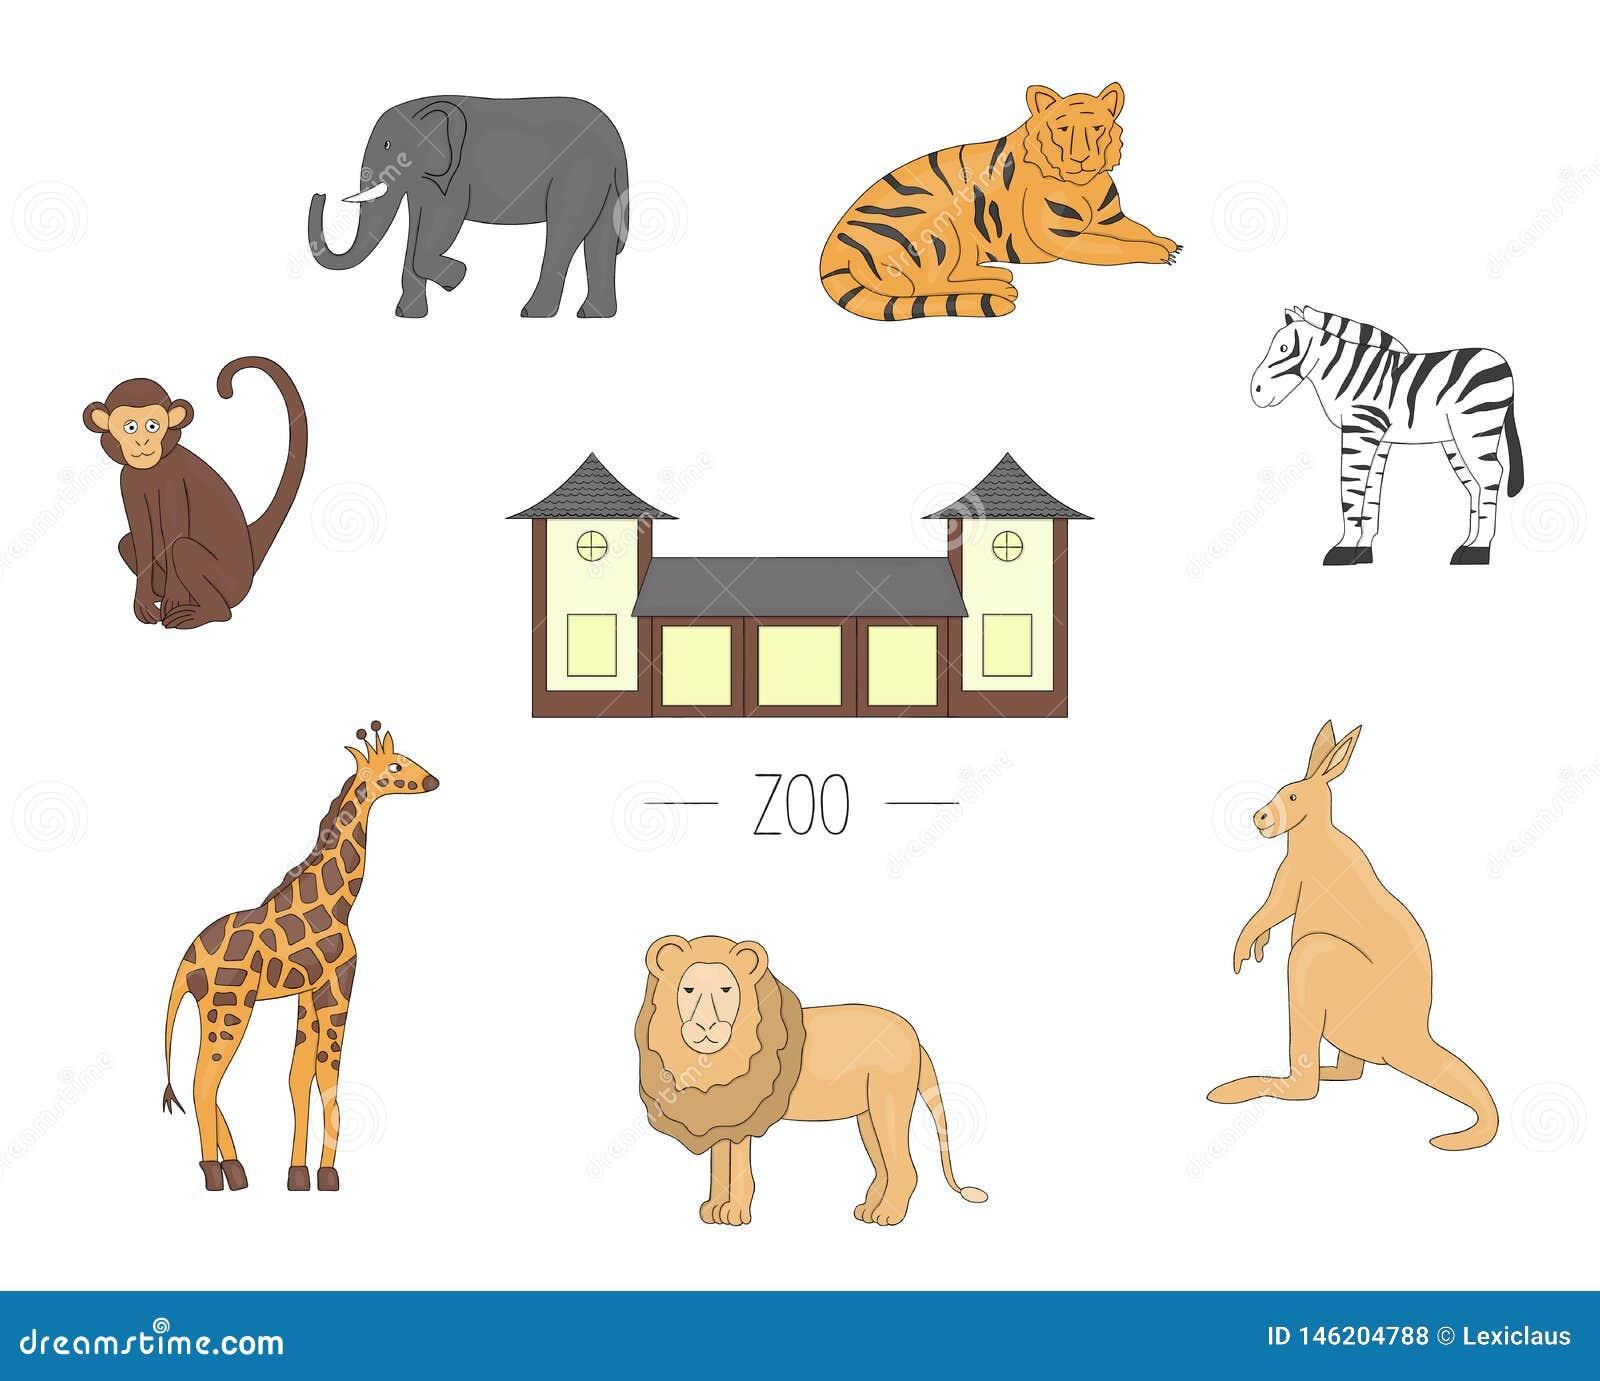 Vector illustration zoo animals isolated on white background